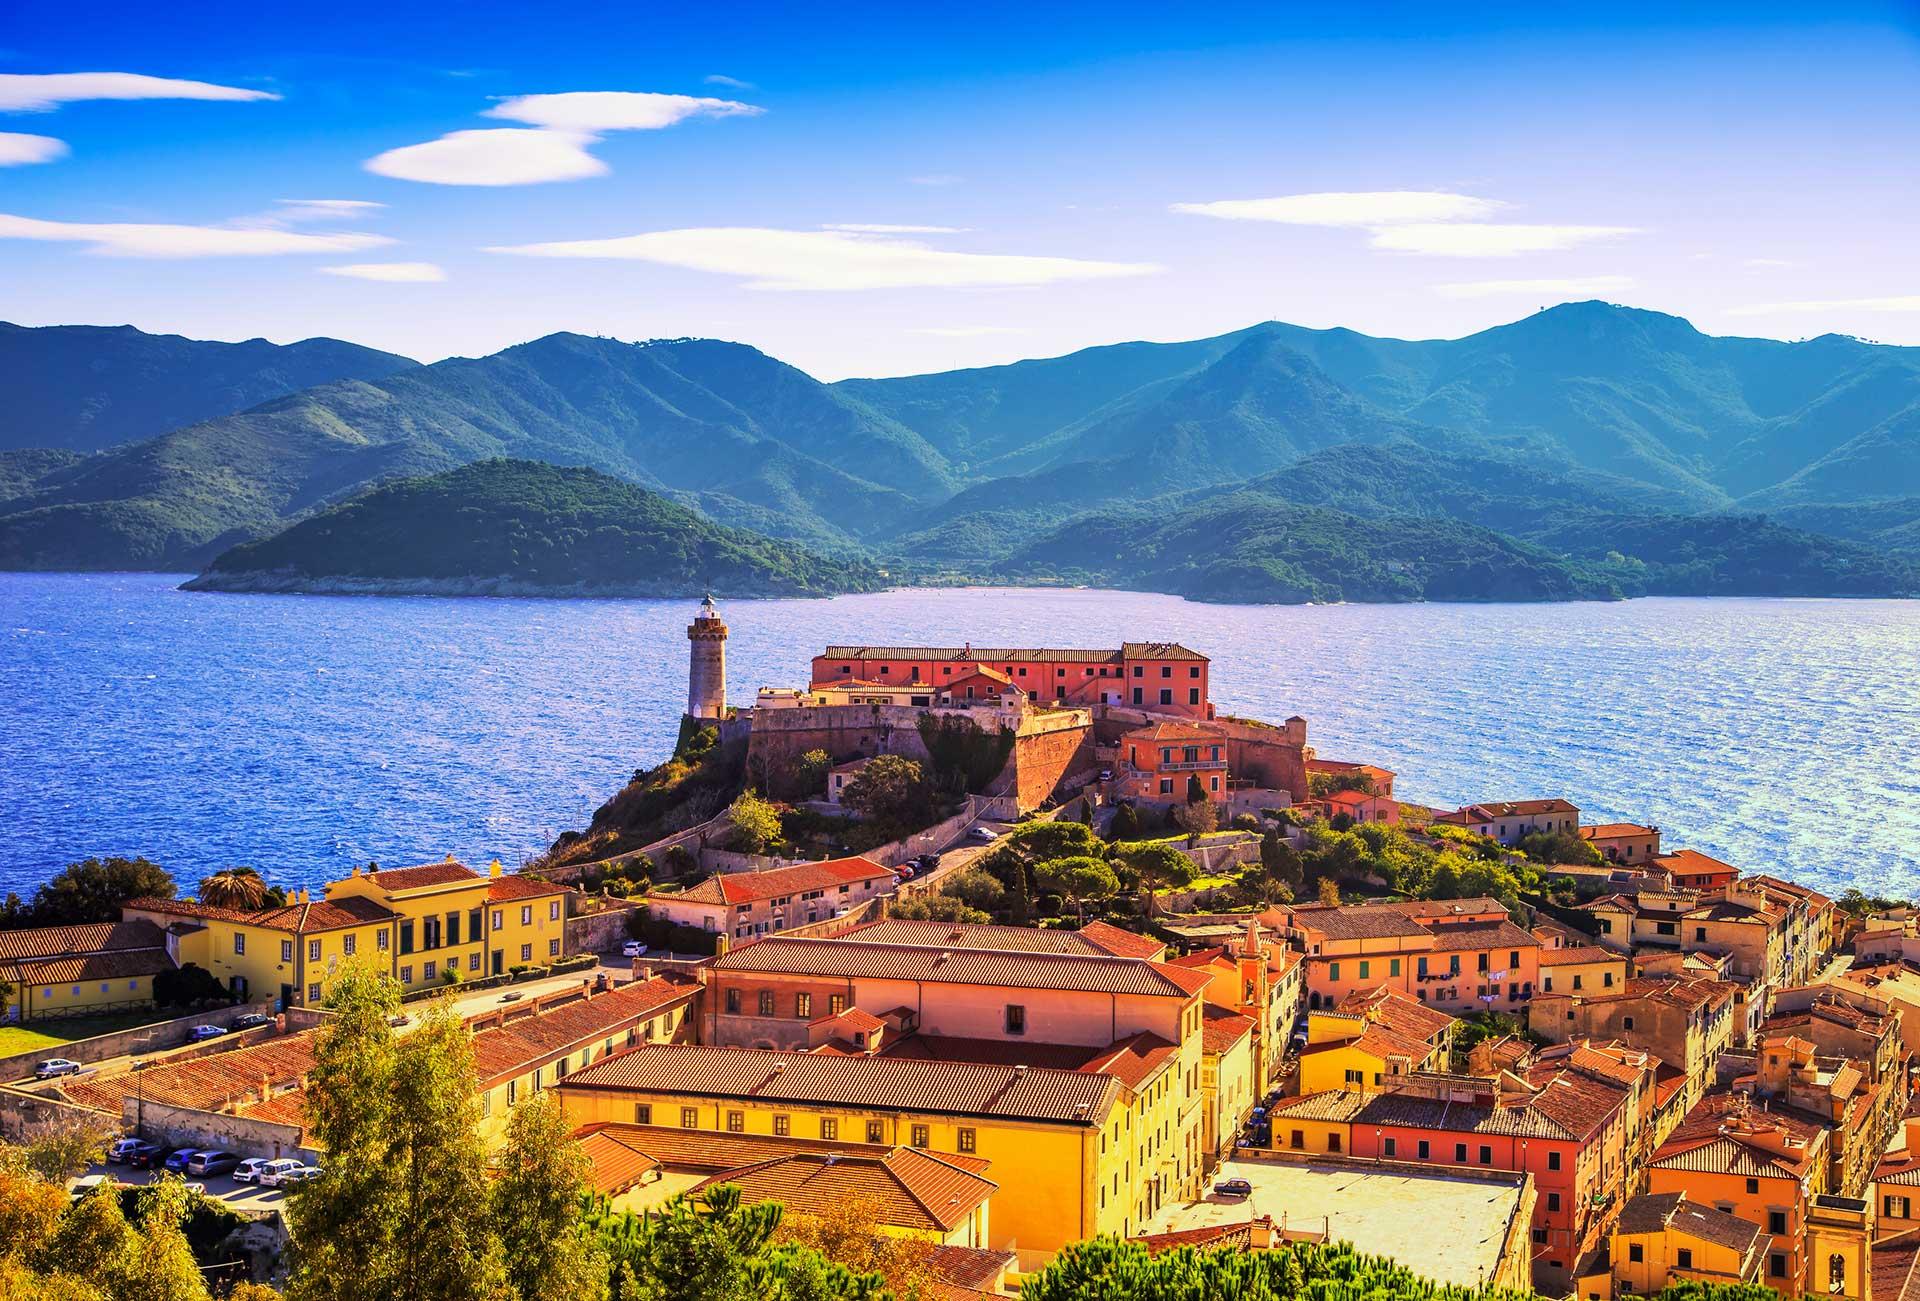 Toskana-Insel-Elba-Fotolia_104027687_XL